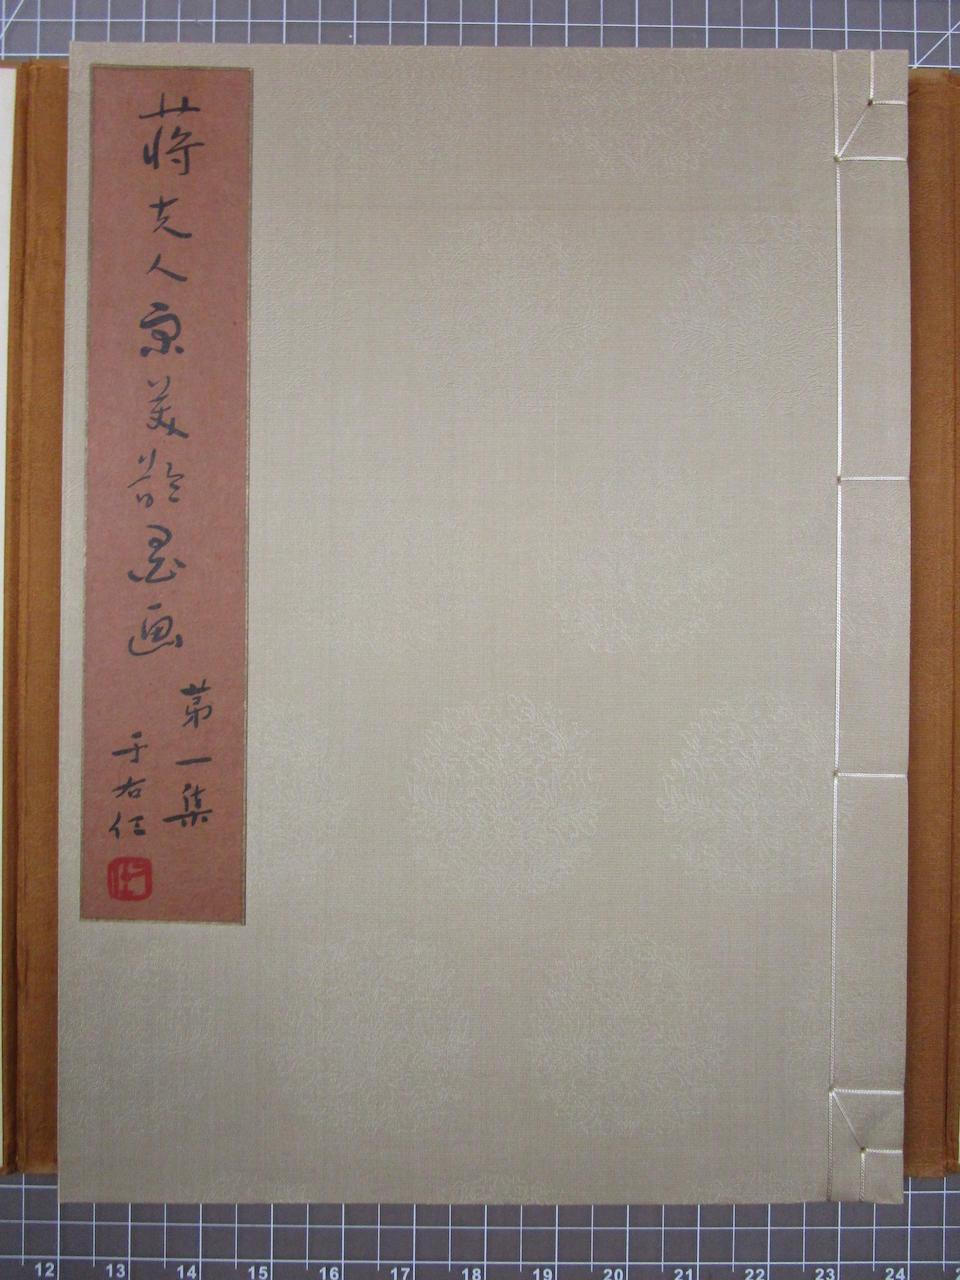 Paintings by Madame Chiang Kai-Shek, Vol. I